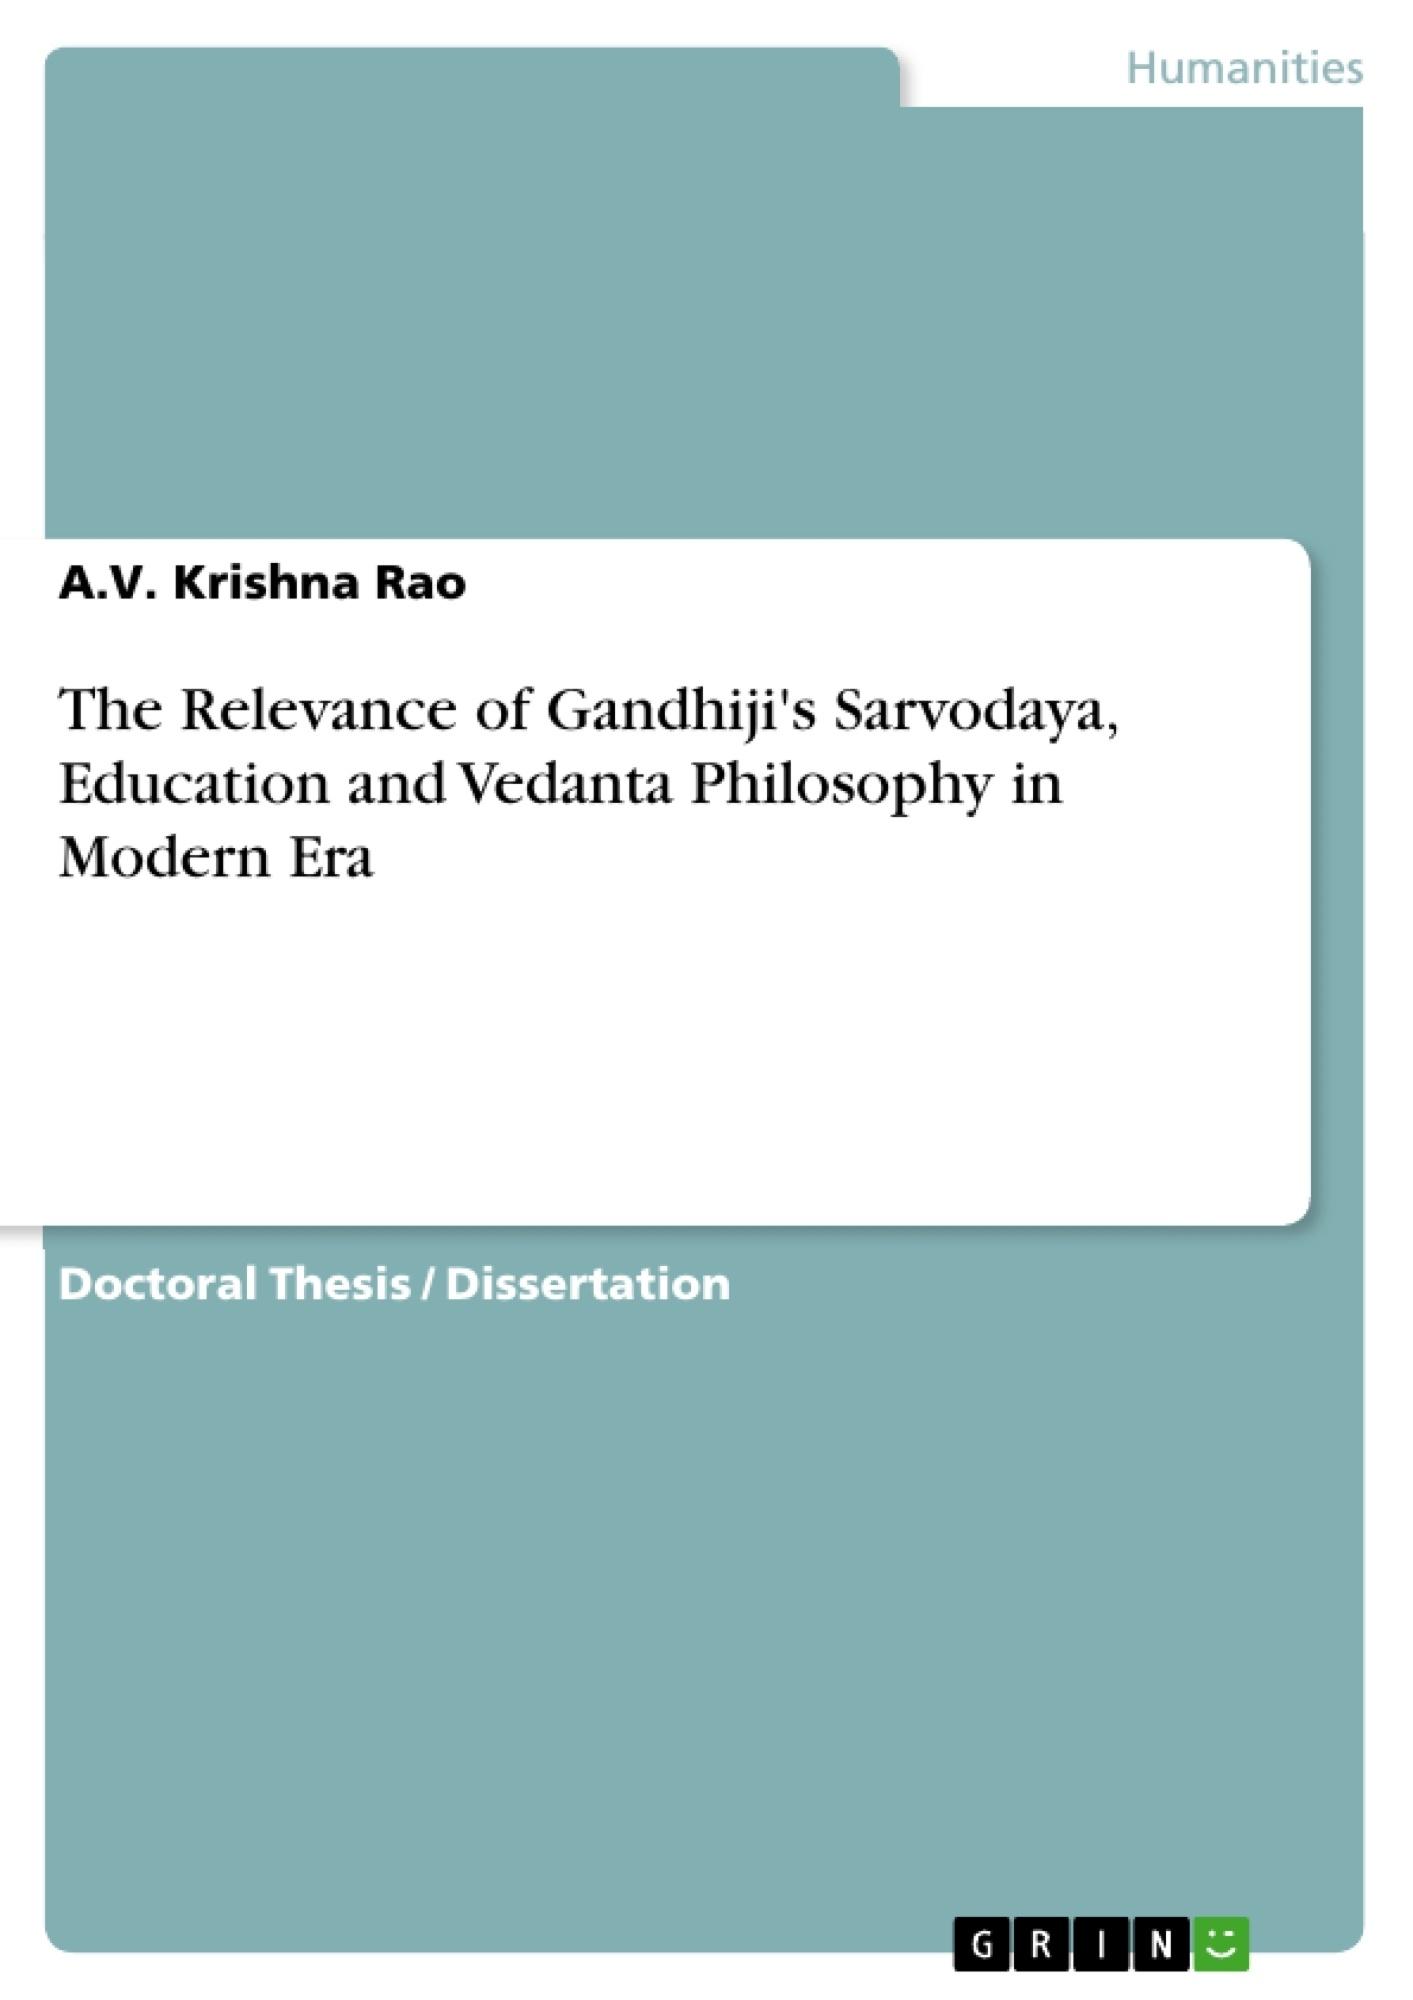 Title: The Relevance of Gandhiji's Sarvodaya, Education and Vedanta Philosophy in Modern Era